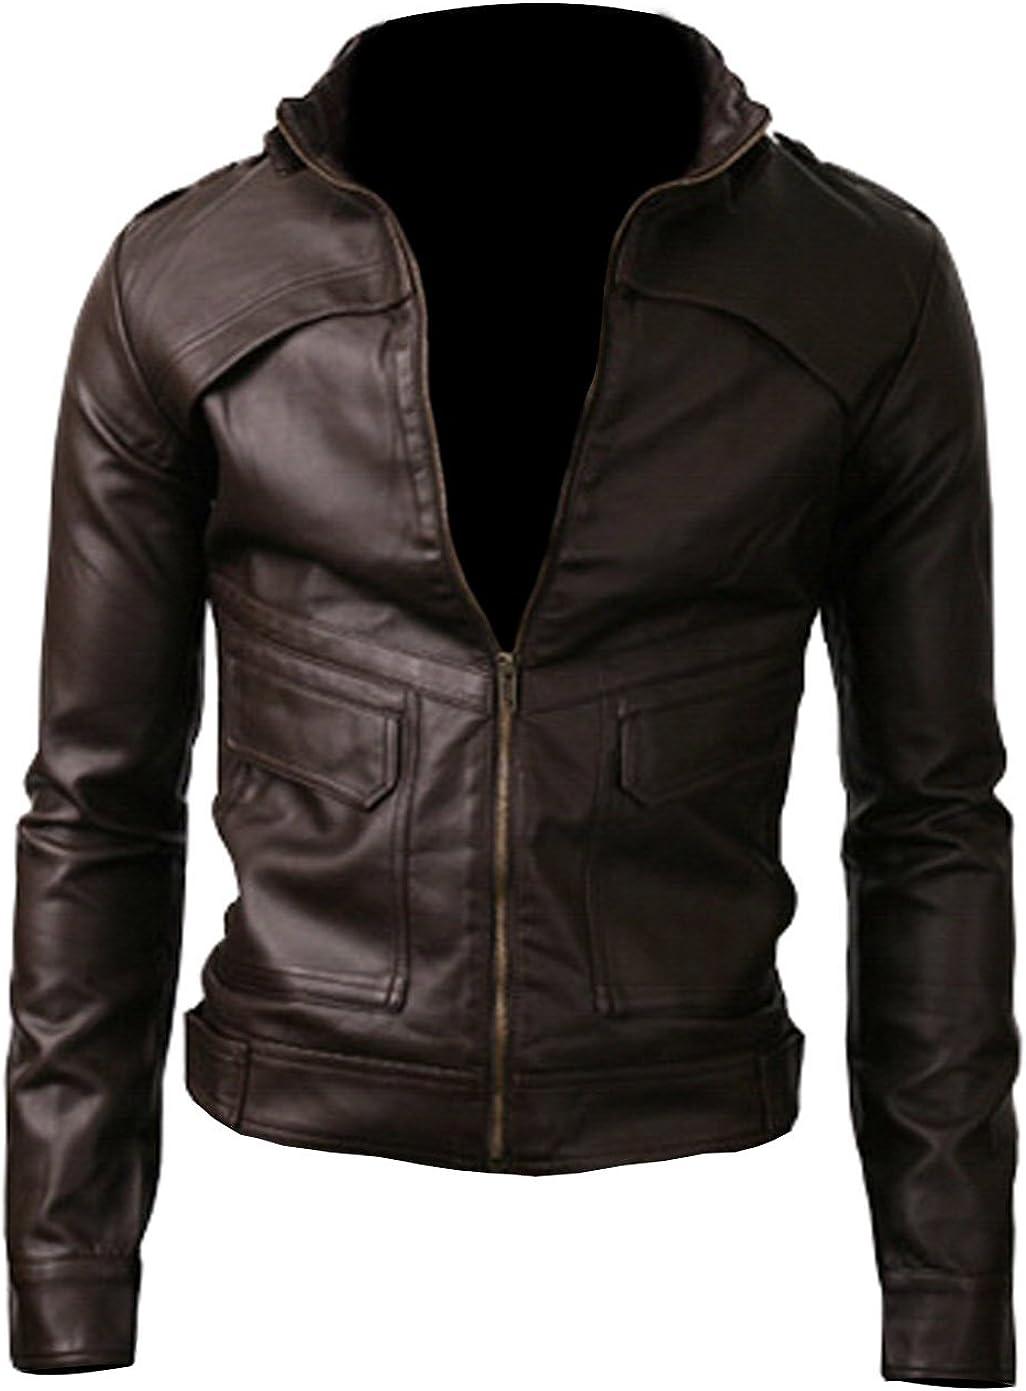 Strap Pocket Dark Brown Vintage Slimfit Jacket